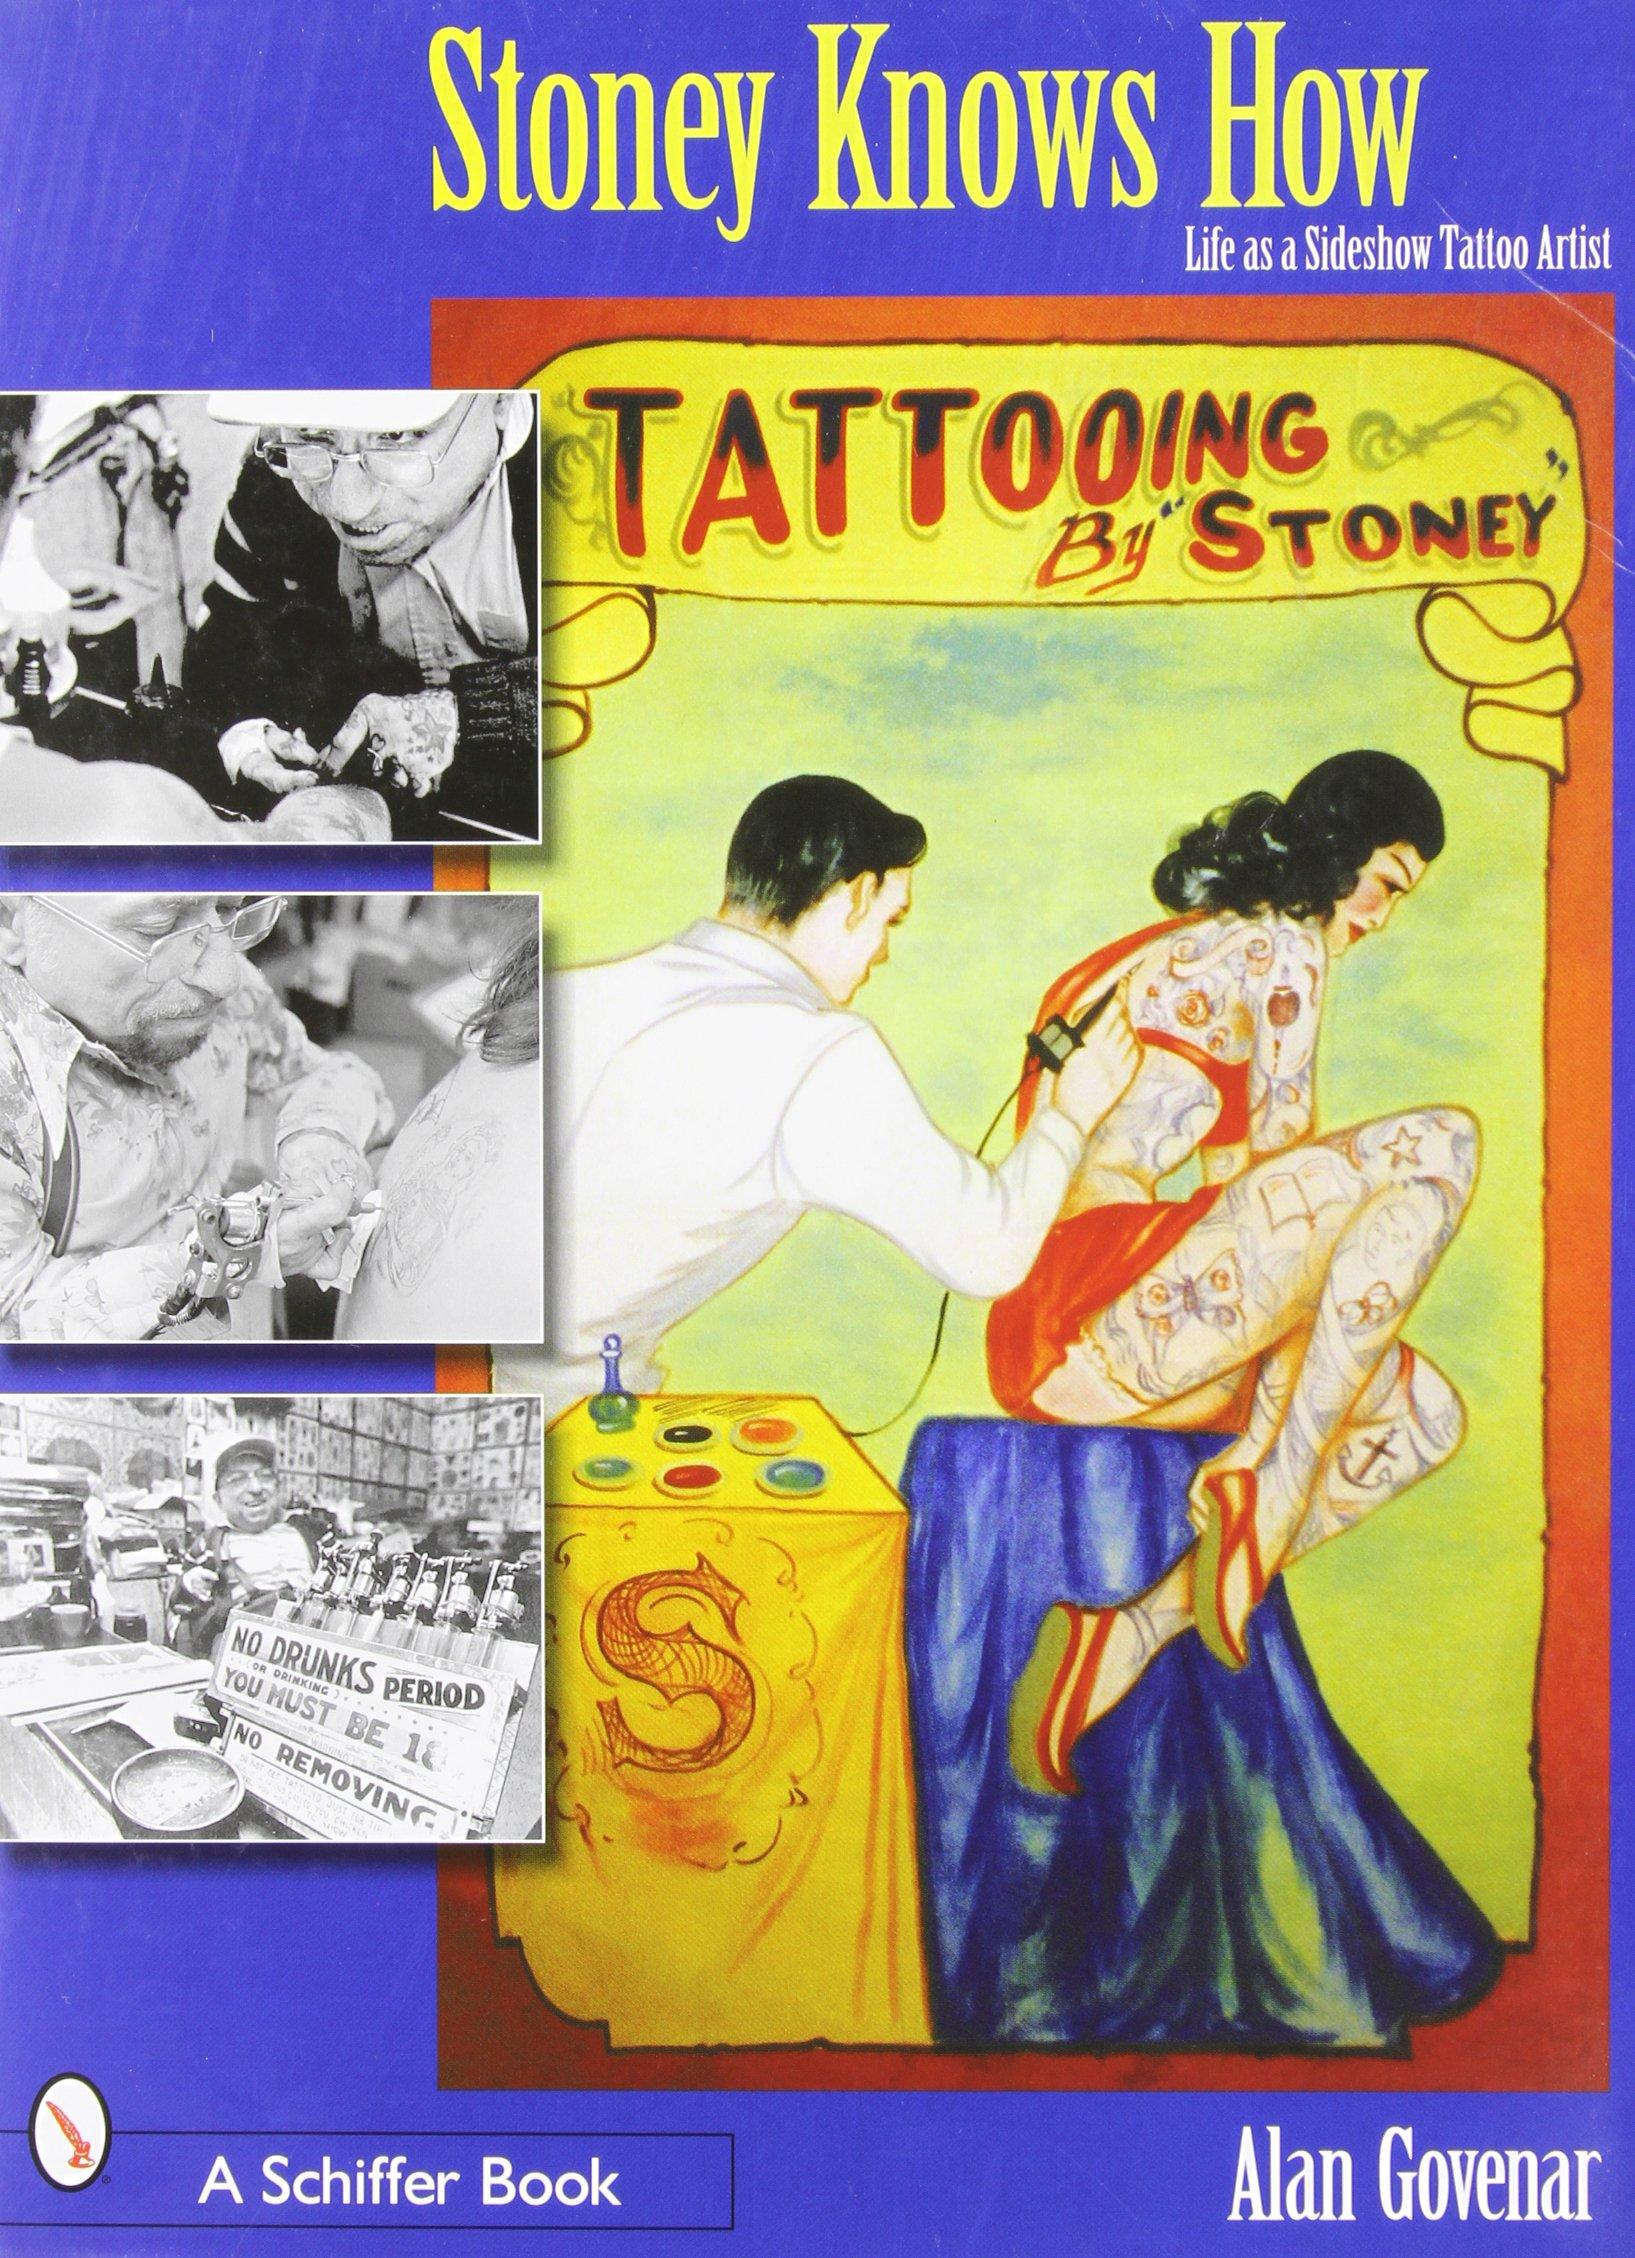 Stoney Knows How: Life As a Sideshow Tattoo Artist: Alan Govenar:  9780764318320: Amazon.com: Books